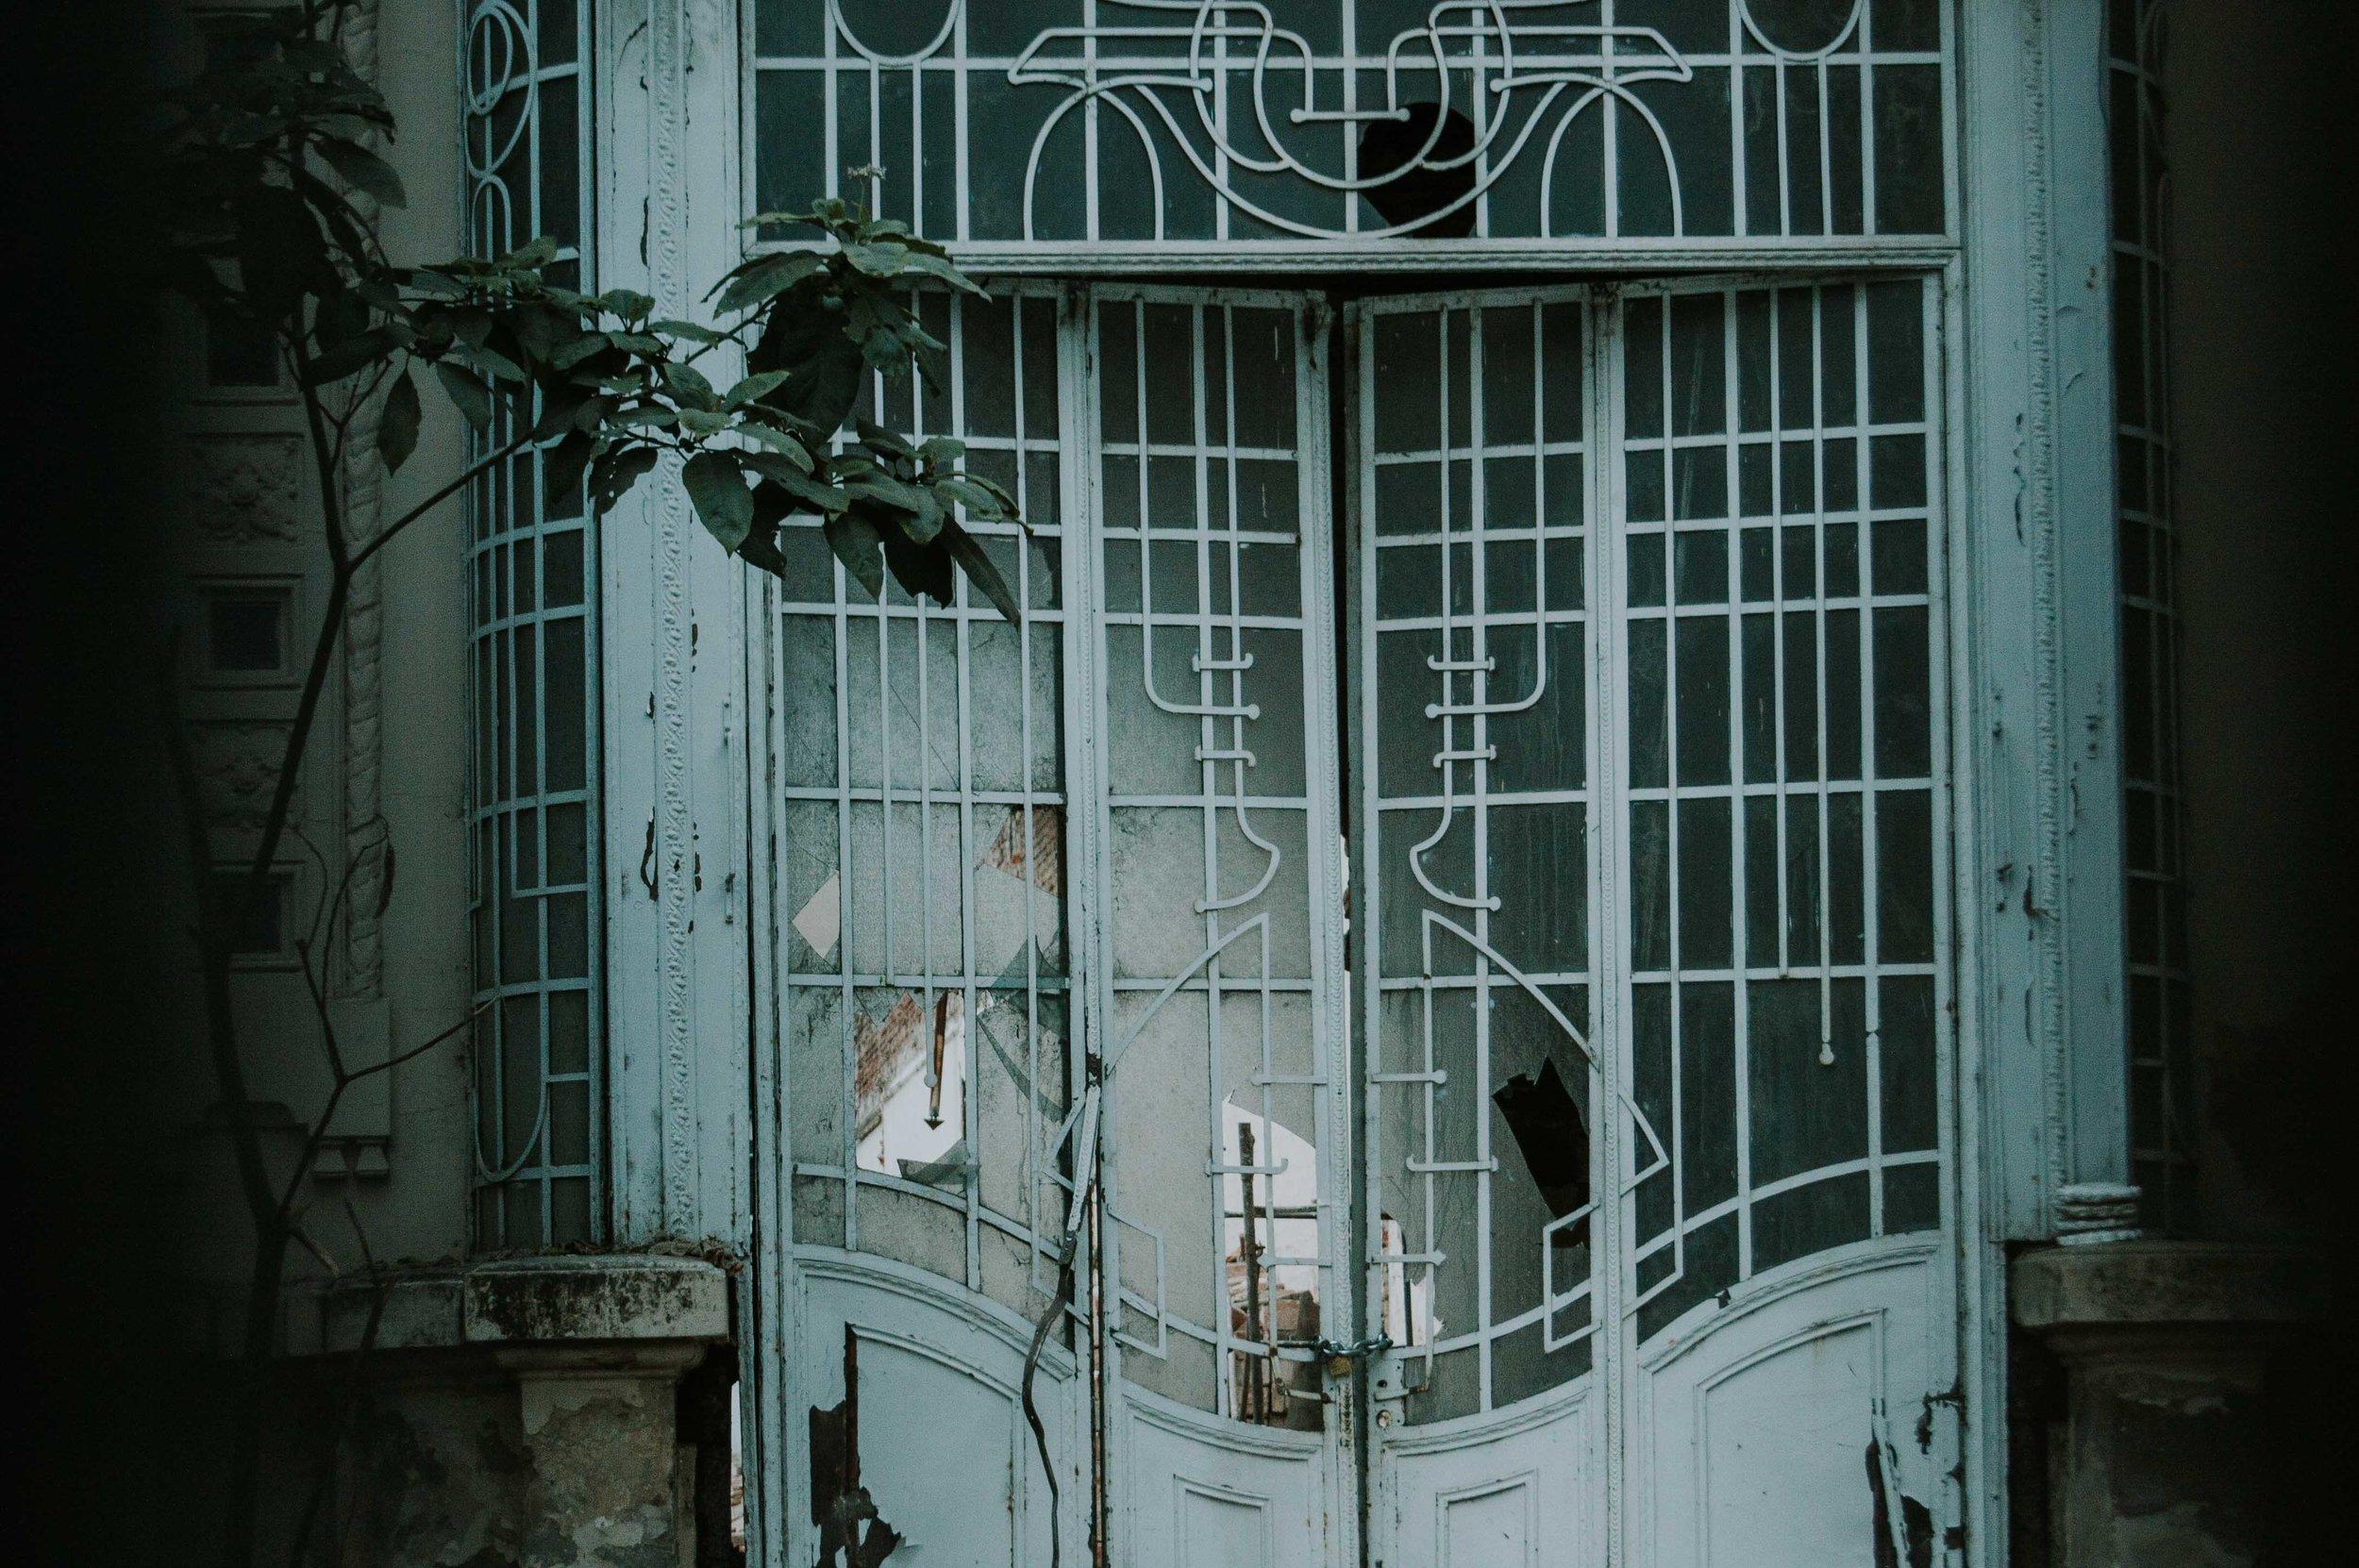 Demoler el viejo urbanismo - Agostina Rossini-4.jpg